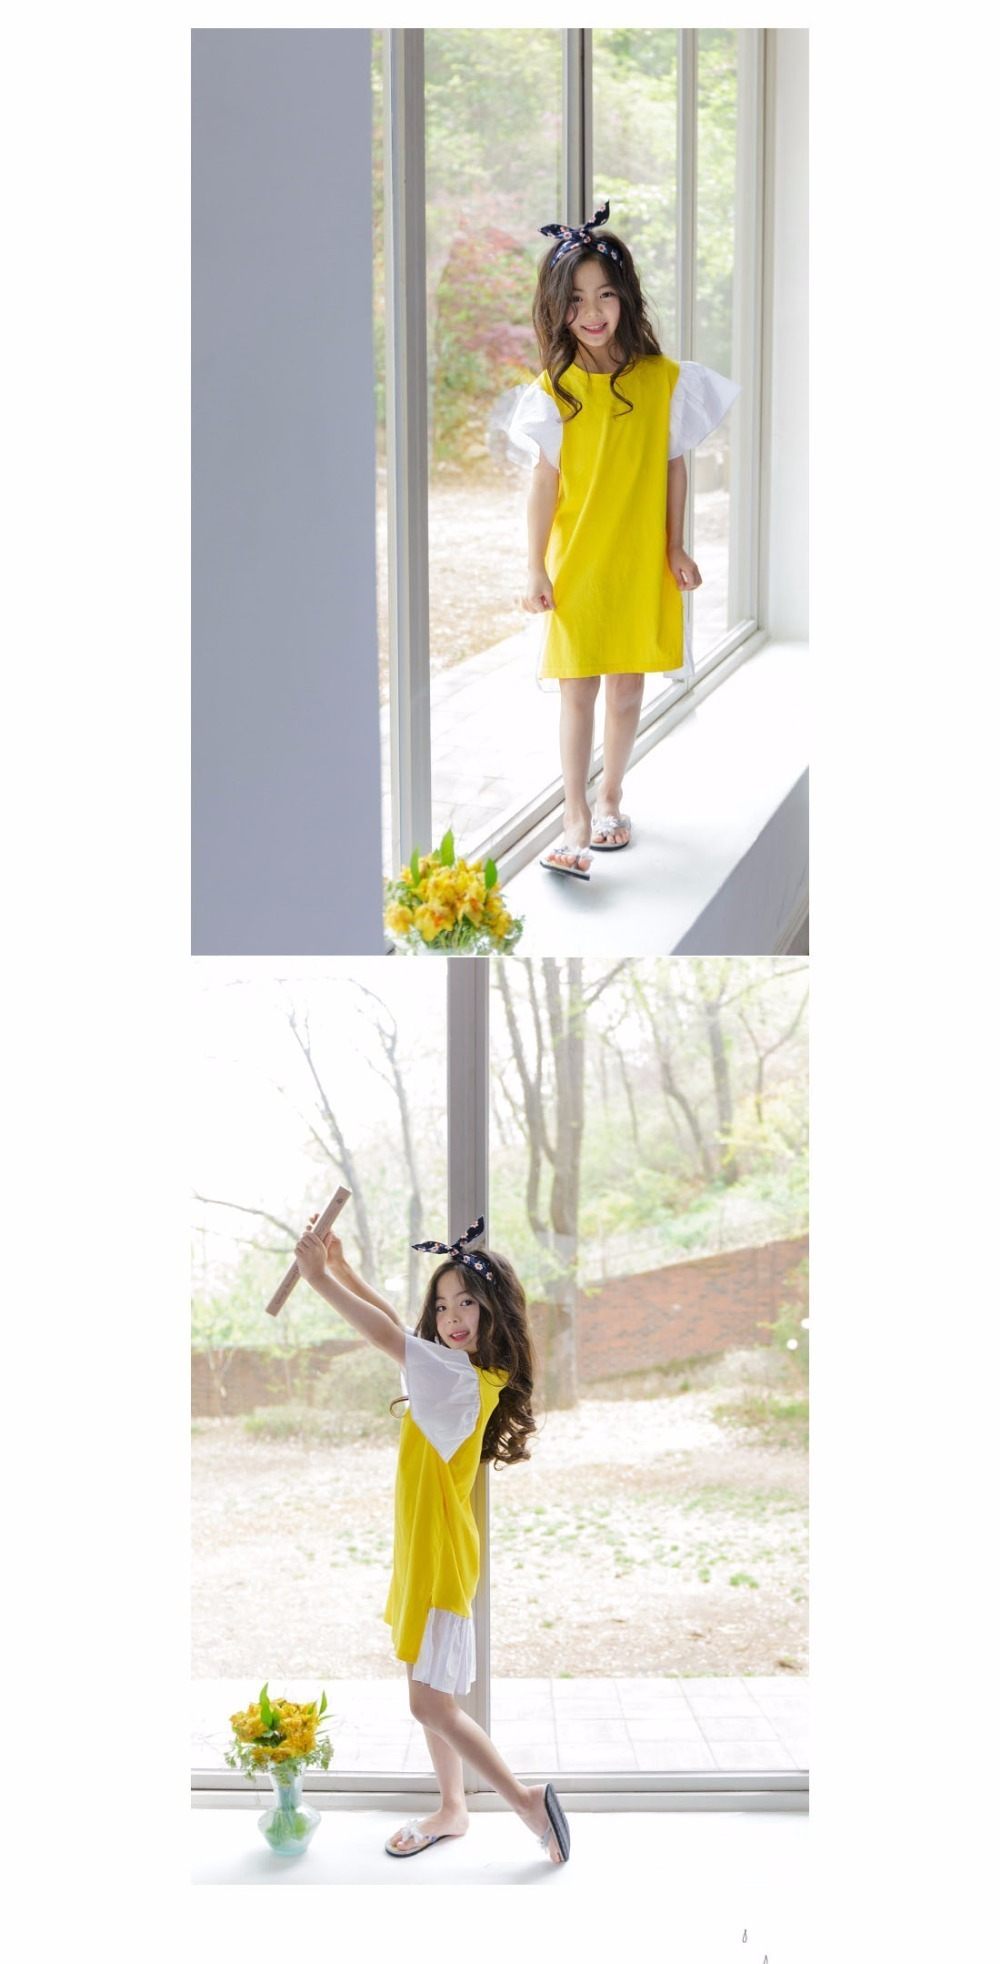 ruffles patchwork little big girl dresses cotton summer 2017 yellow knee legnth kids dresses designs Children Boutique Clothes 4 5 6 7 8 9 10 11 12 13 14 years old little big teenage girls dresses summer dress girl kids 2017 (11)